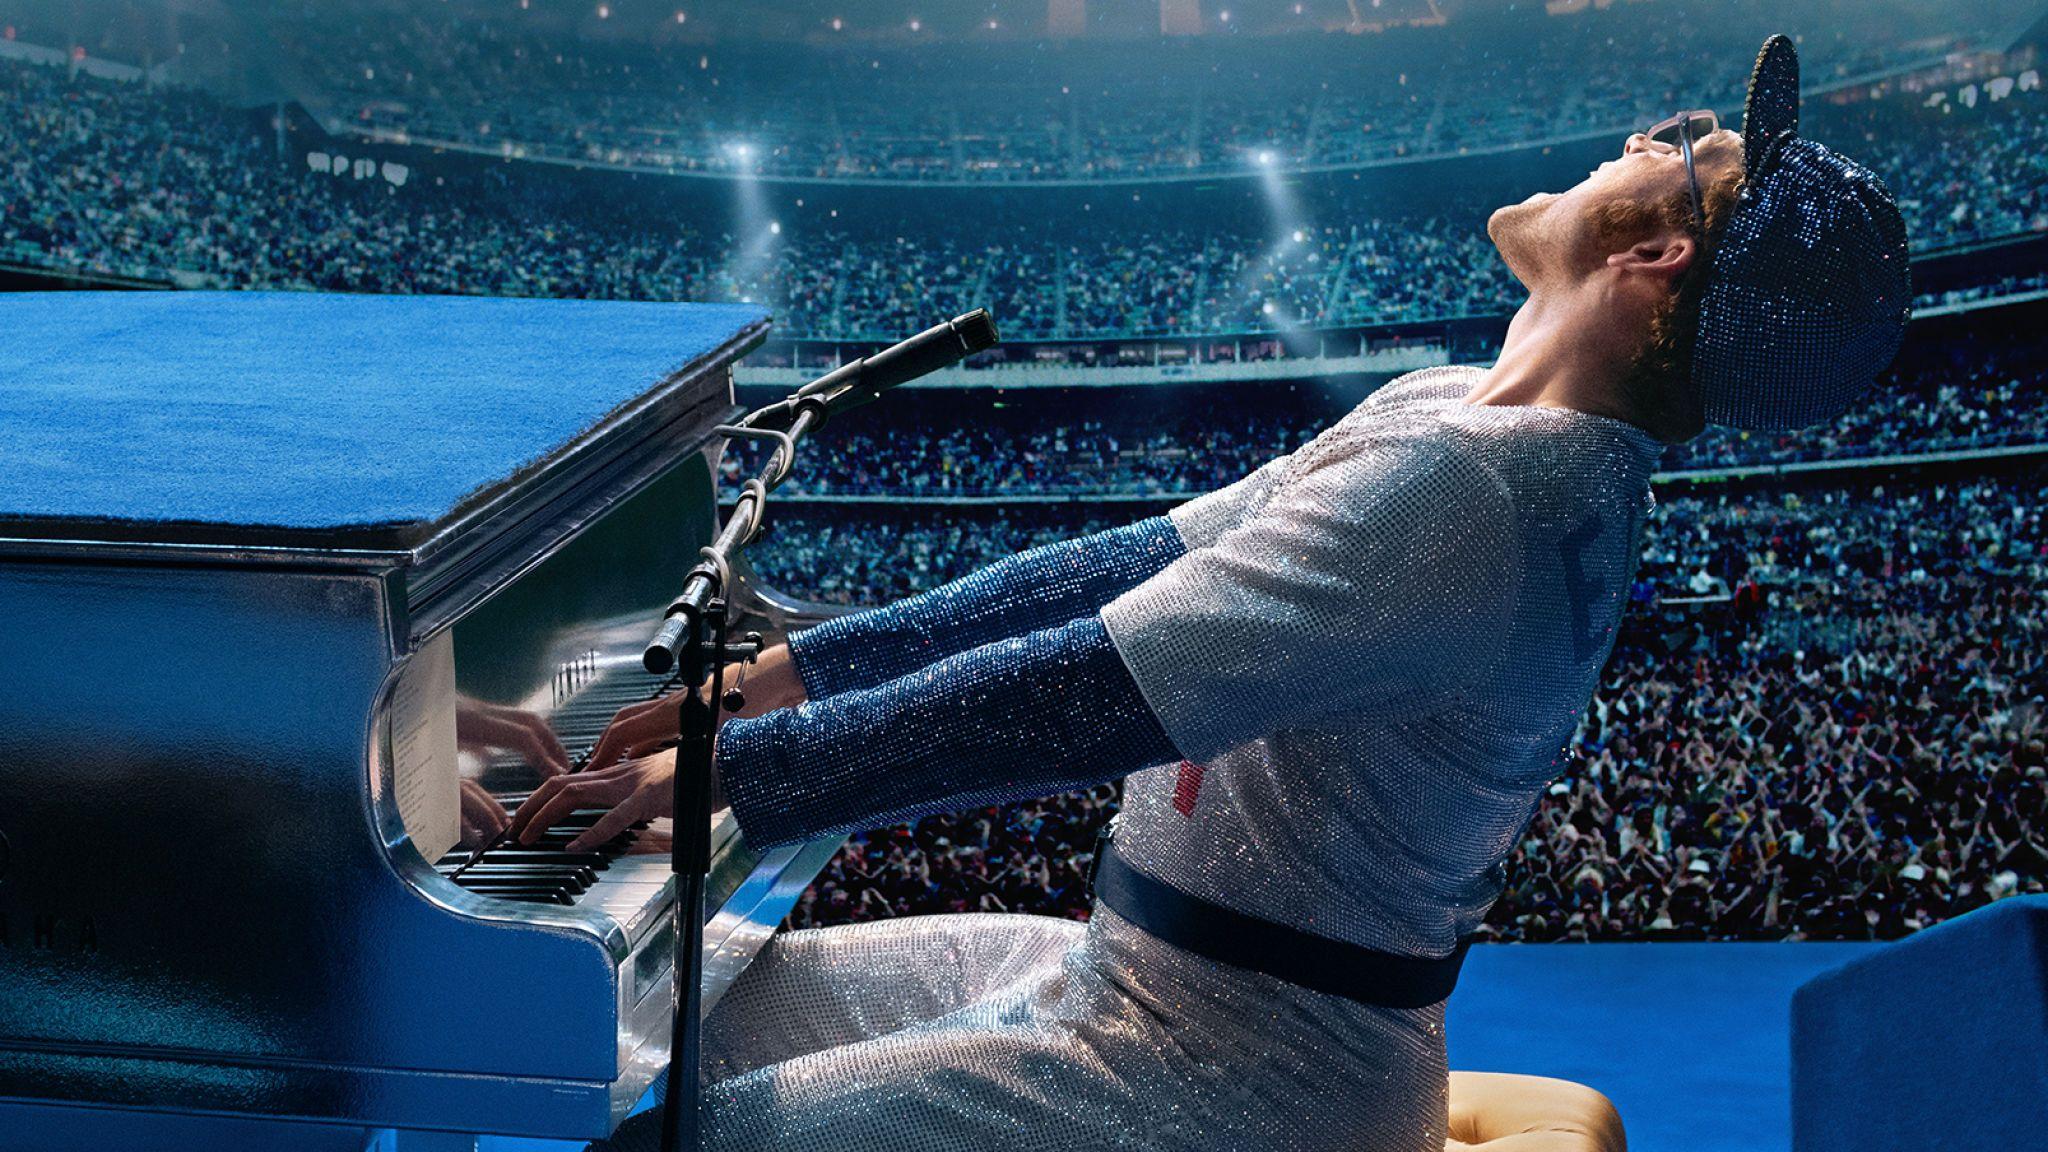 Taron Egerton as Elton John in Rocketman from Paramount Pictures.